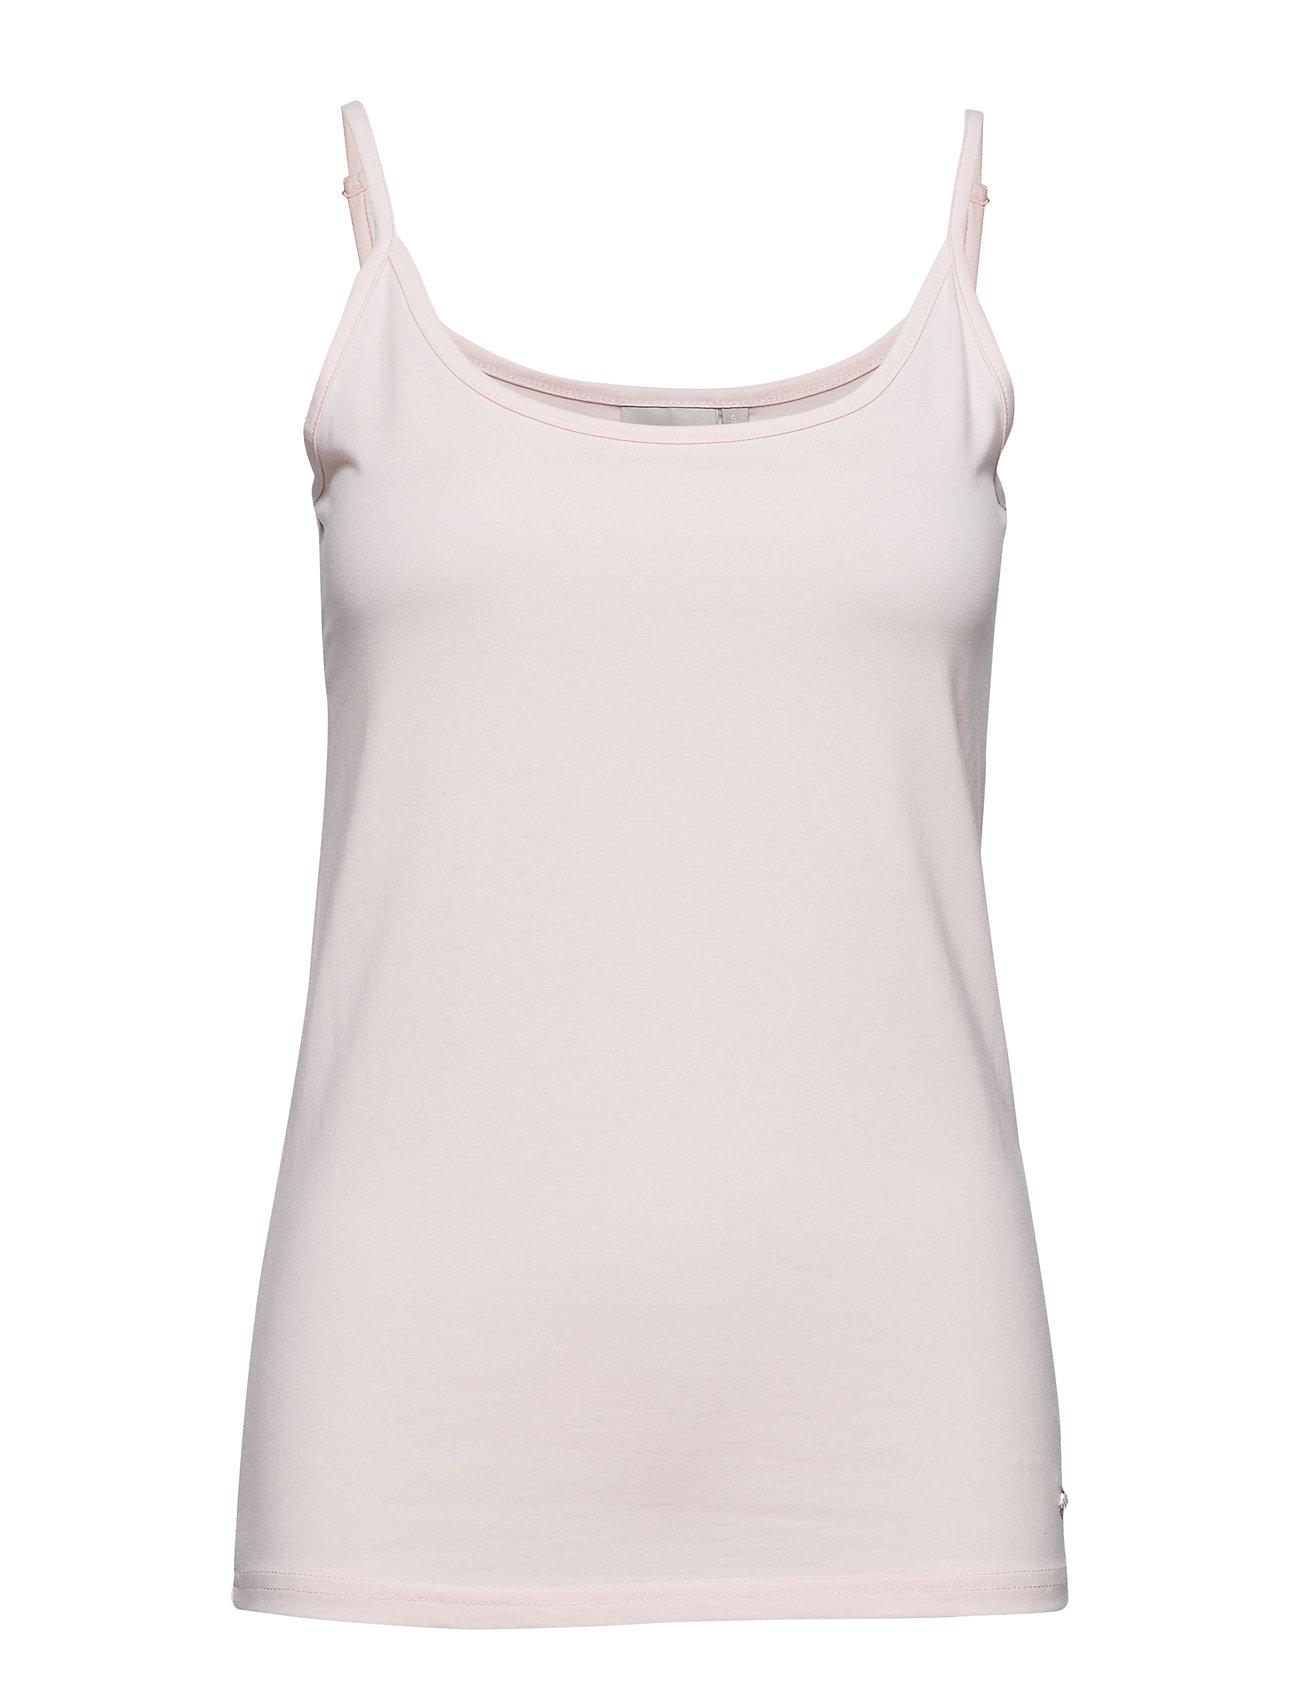 Brandtex Sleeveless-jersey